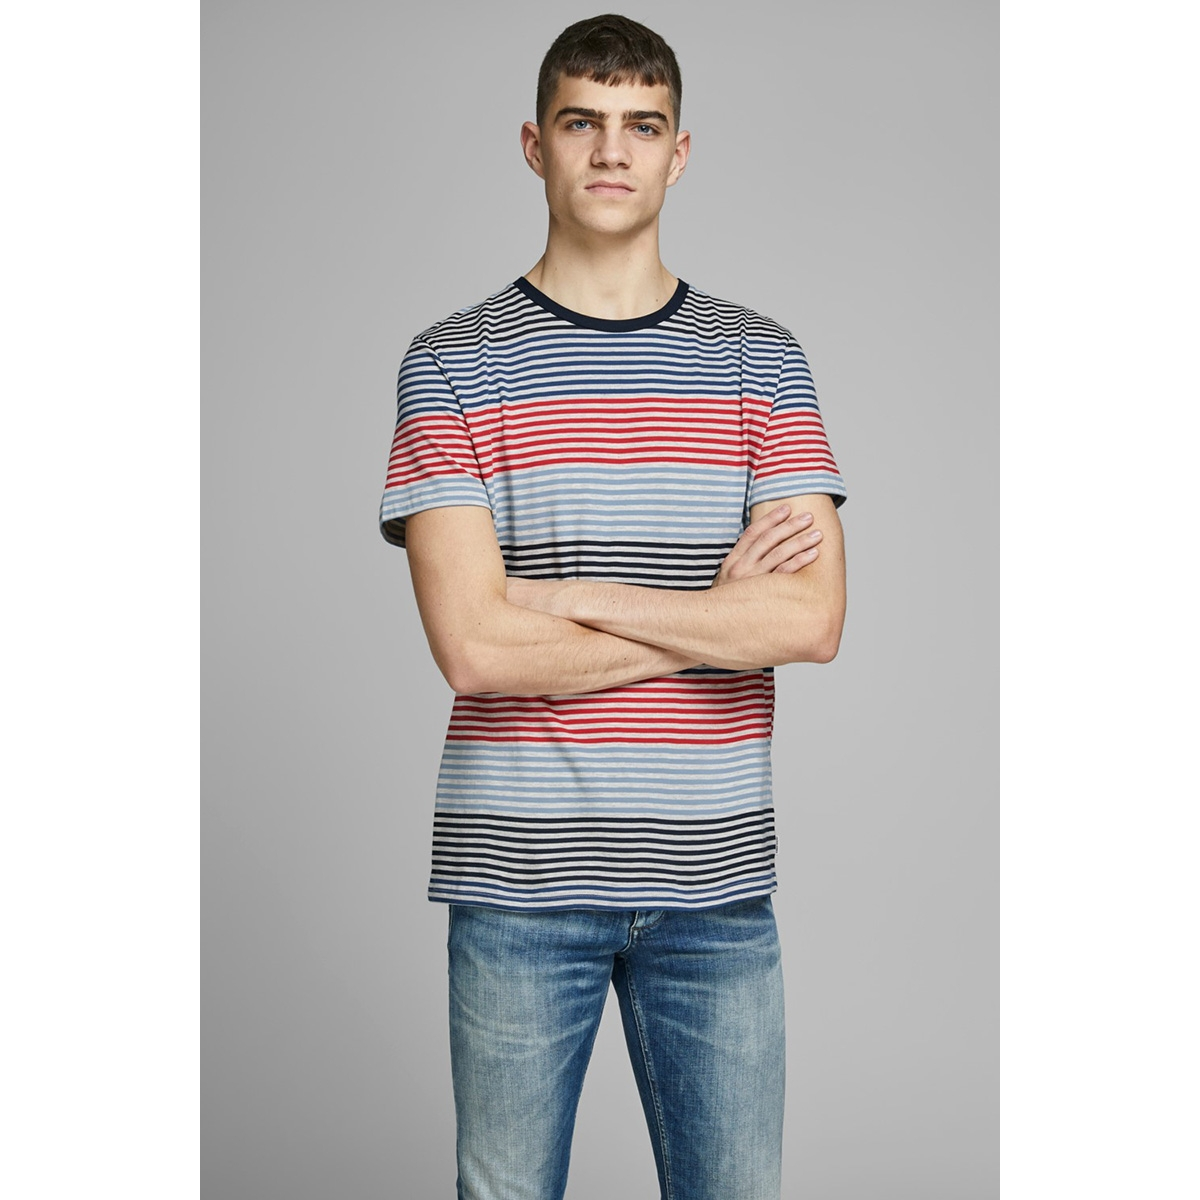 jcoaraf tee ss crew neck 12170181 jack & jones t-shirt chinese red/slim